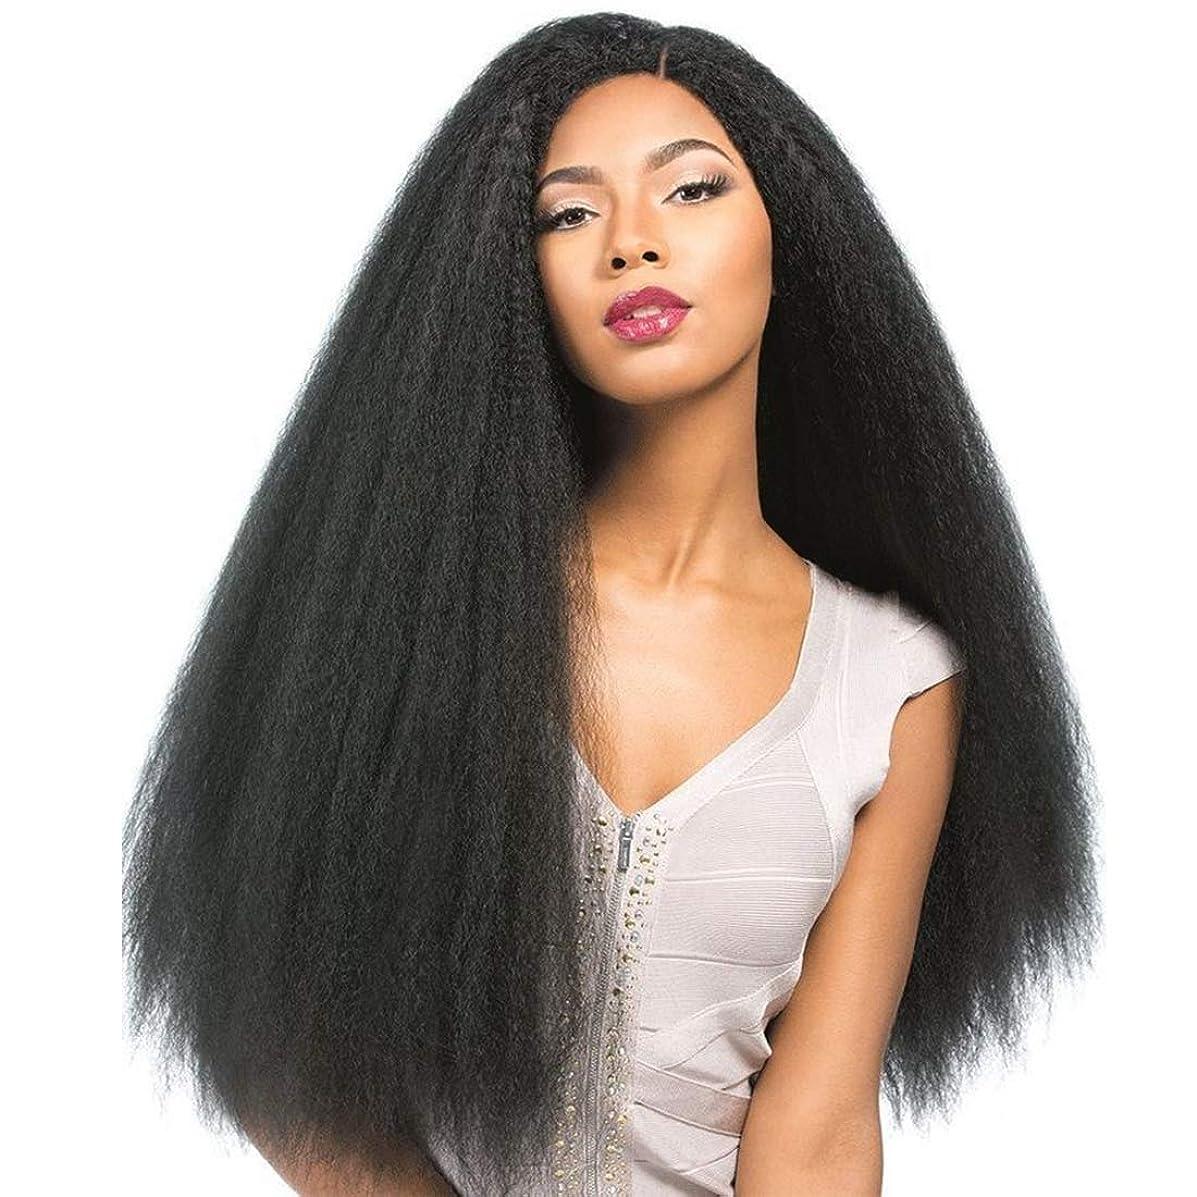 Nadula Brazilian Yaki Kinky Straight Wig 130% Density Free Part Remy hair wigs 8-24 Inch Natural Color 13×4 Lace Front Human Hair Wigs (18inch, Natural Color)